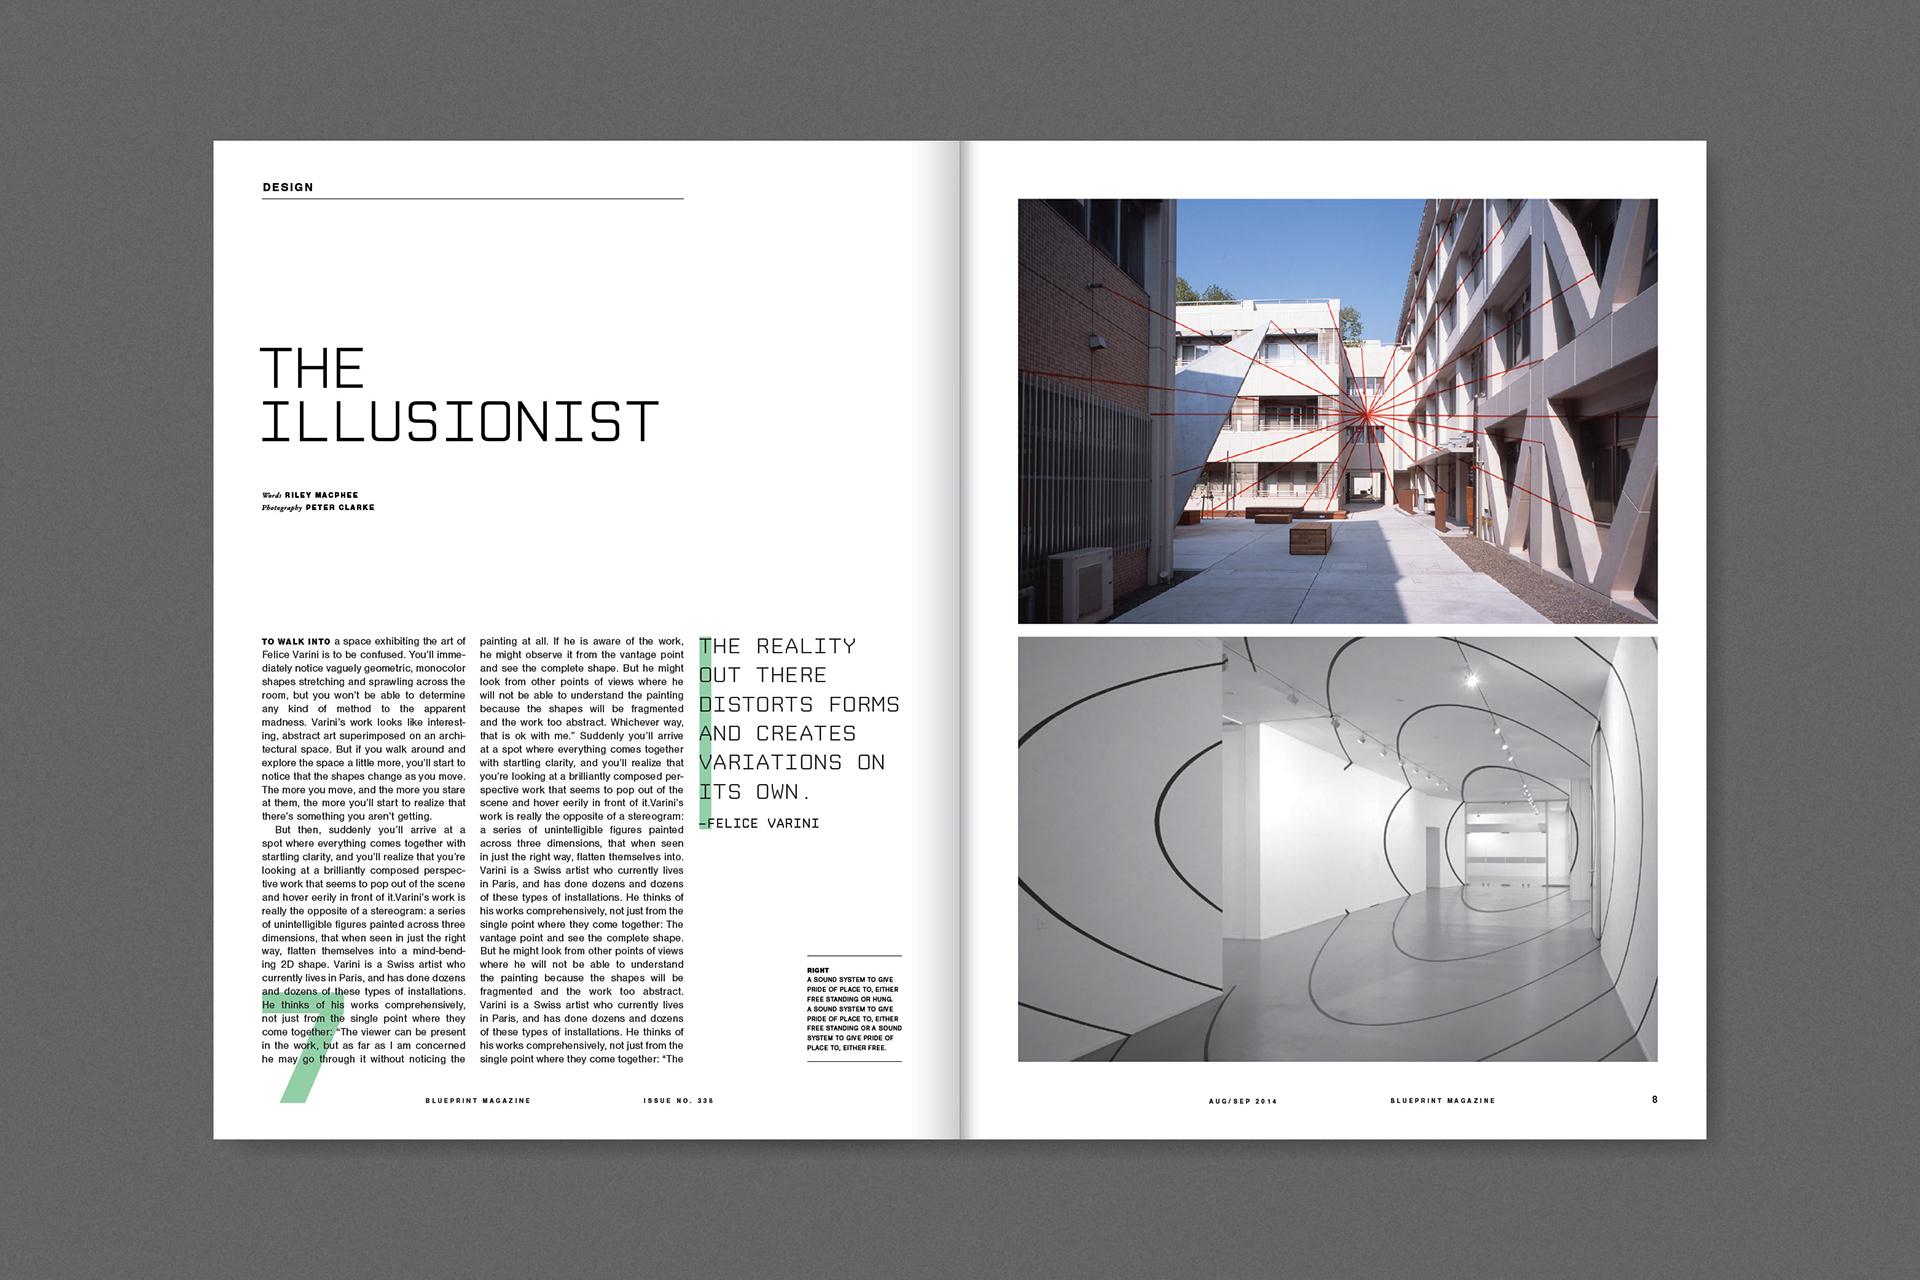 Ben hansen blueprint magazine hypothetical redesign of blueprint magazine a uk based architecture magazine malvernweather Image collections